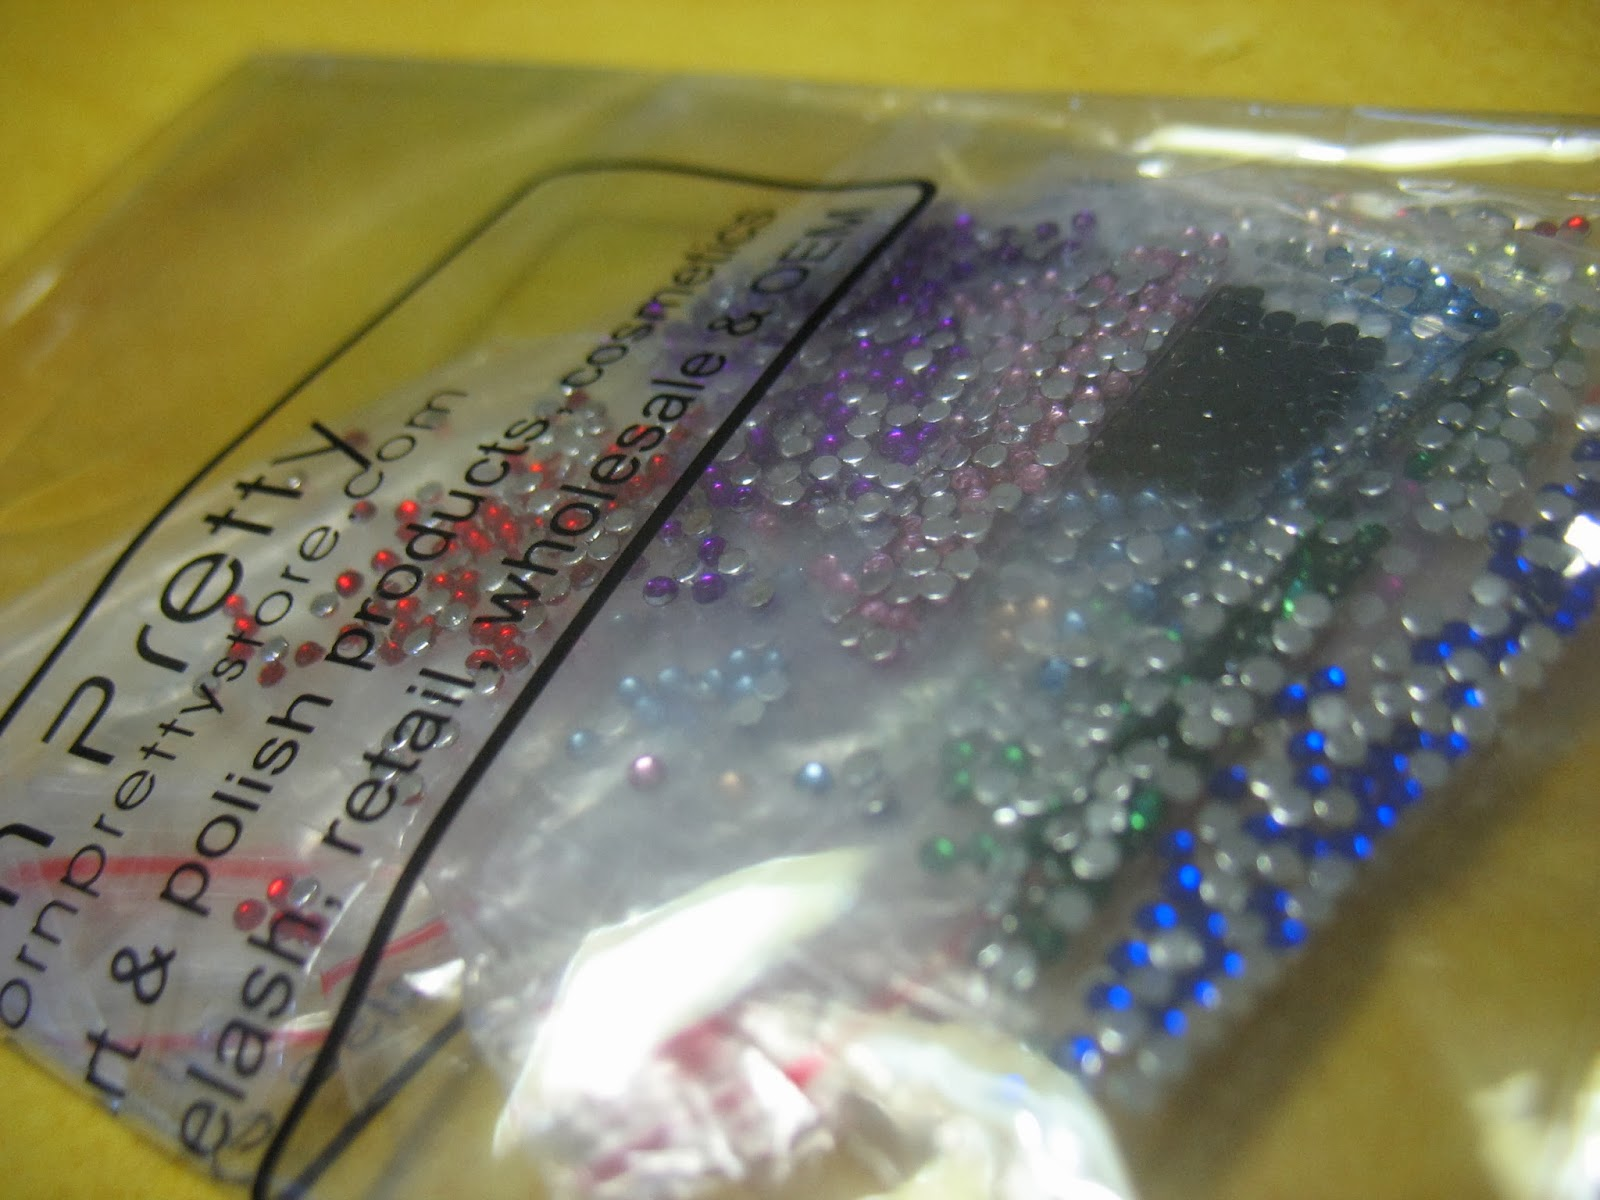 http://www.bornprettystore.com/100pcs-15mm-colorful-rhinestone-acrylic-nail-colors-p-4995.html